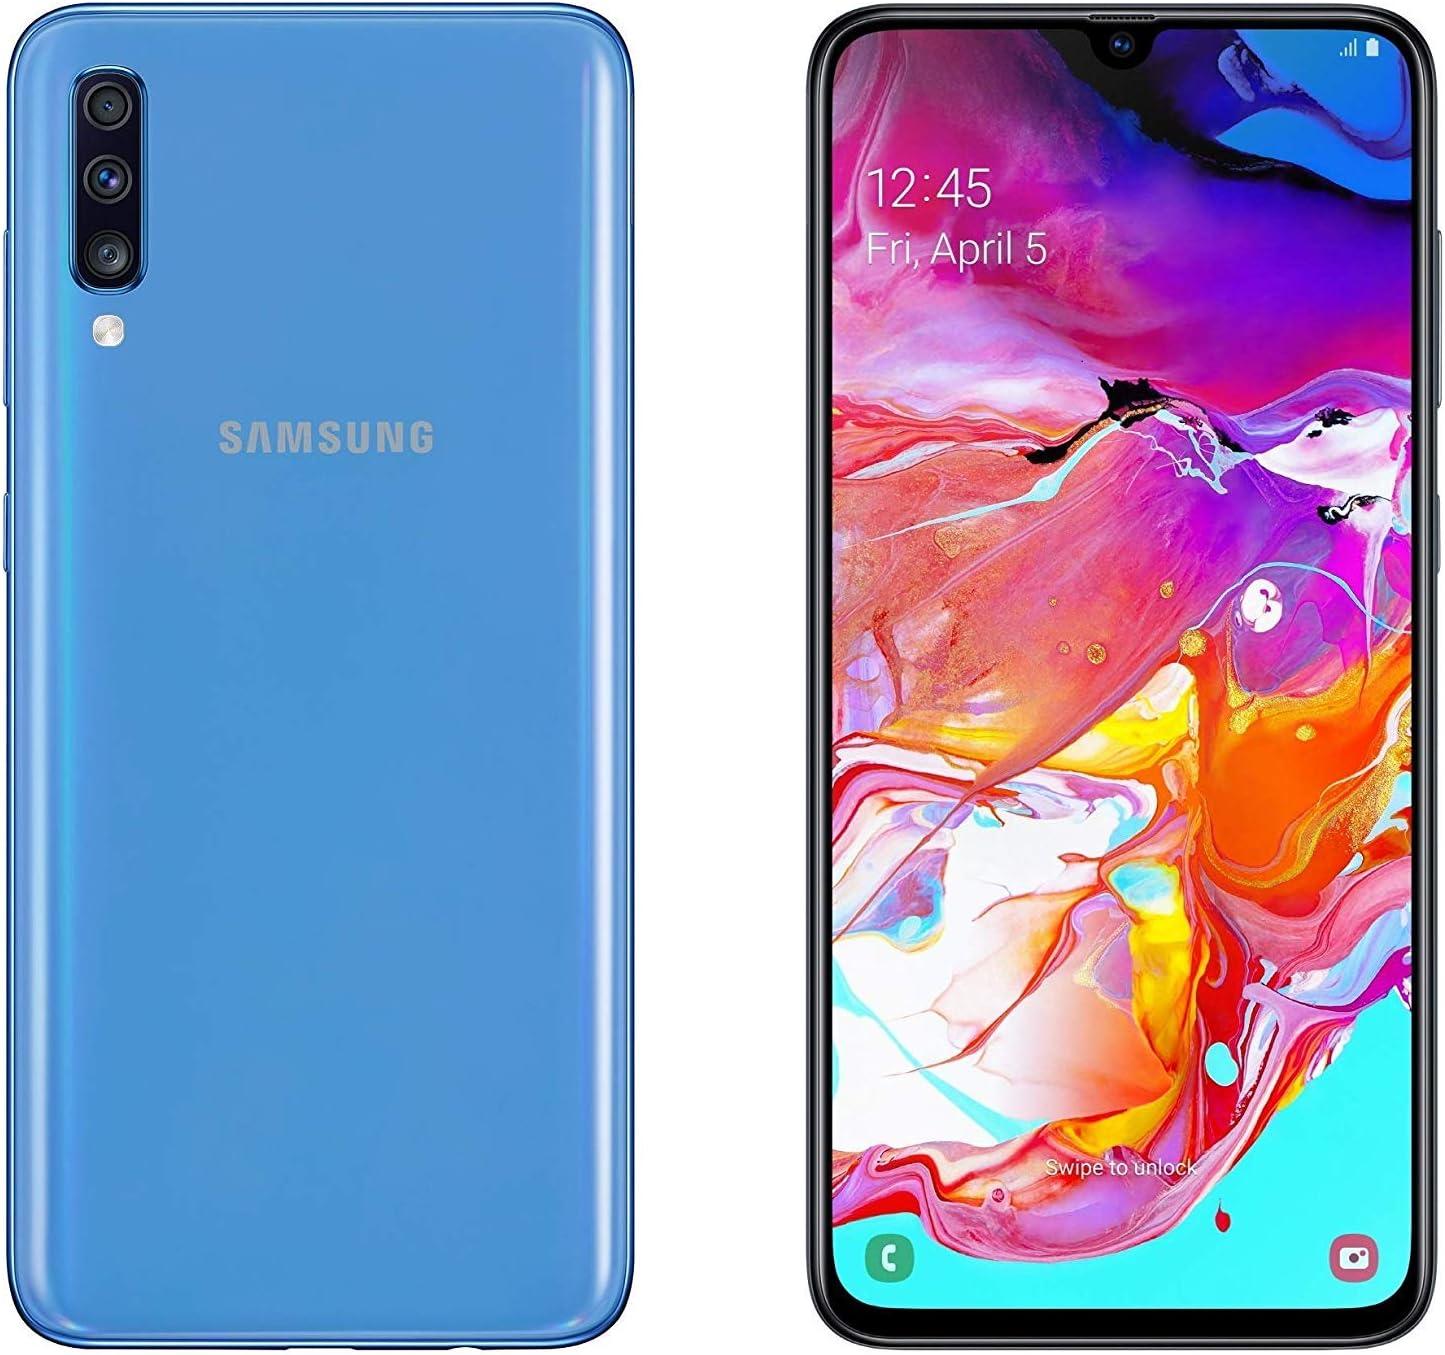 Amazon Com Samsung Galaxy A70 Sm A705f Ds Dual Sim 128gb Rom 6gb Ram 6 7 Inch Gsm Only No Cdma Factory Unlocked 4g Lte Smartphone International Version Blue Electronics